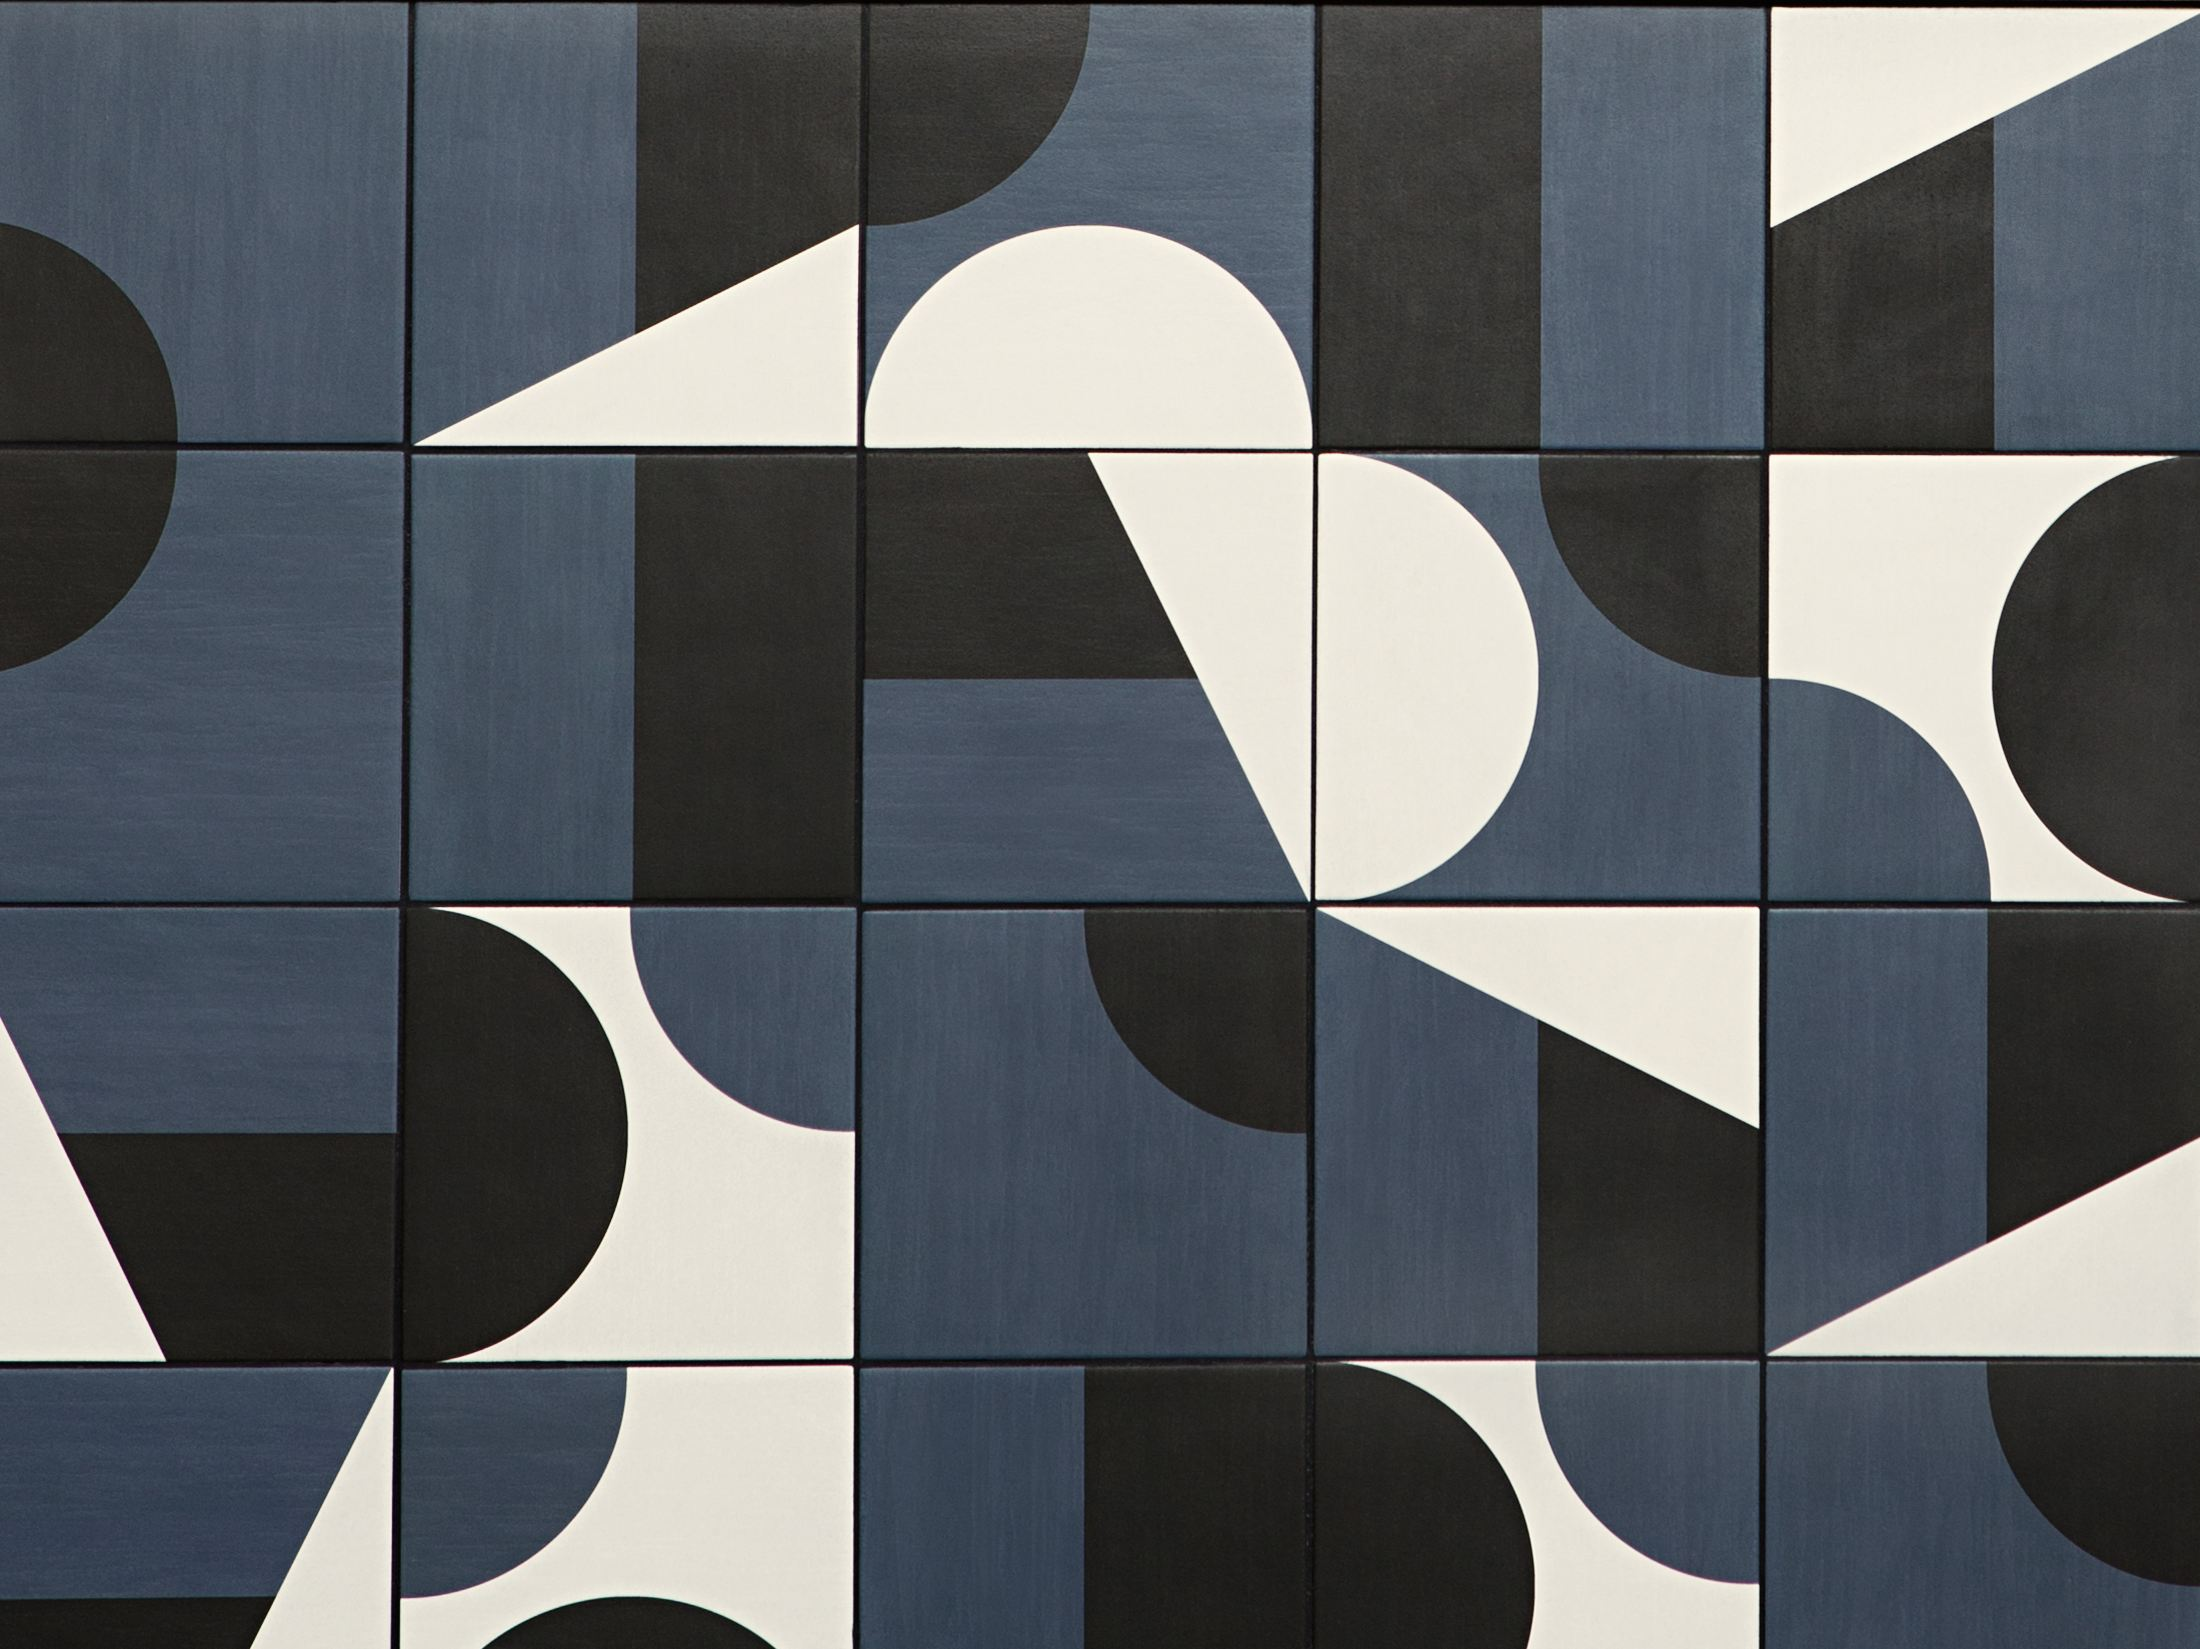 Puzzle Piece Floor Tiles Rebellions